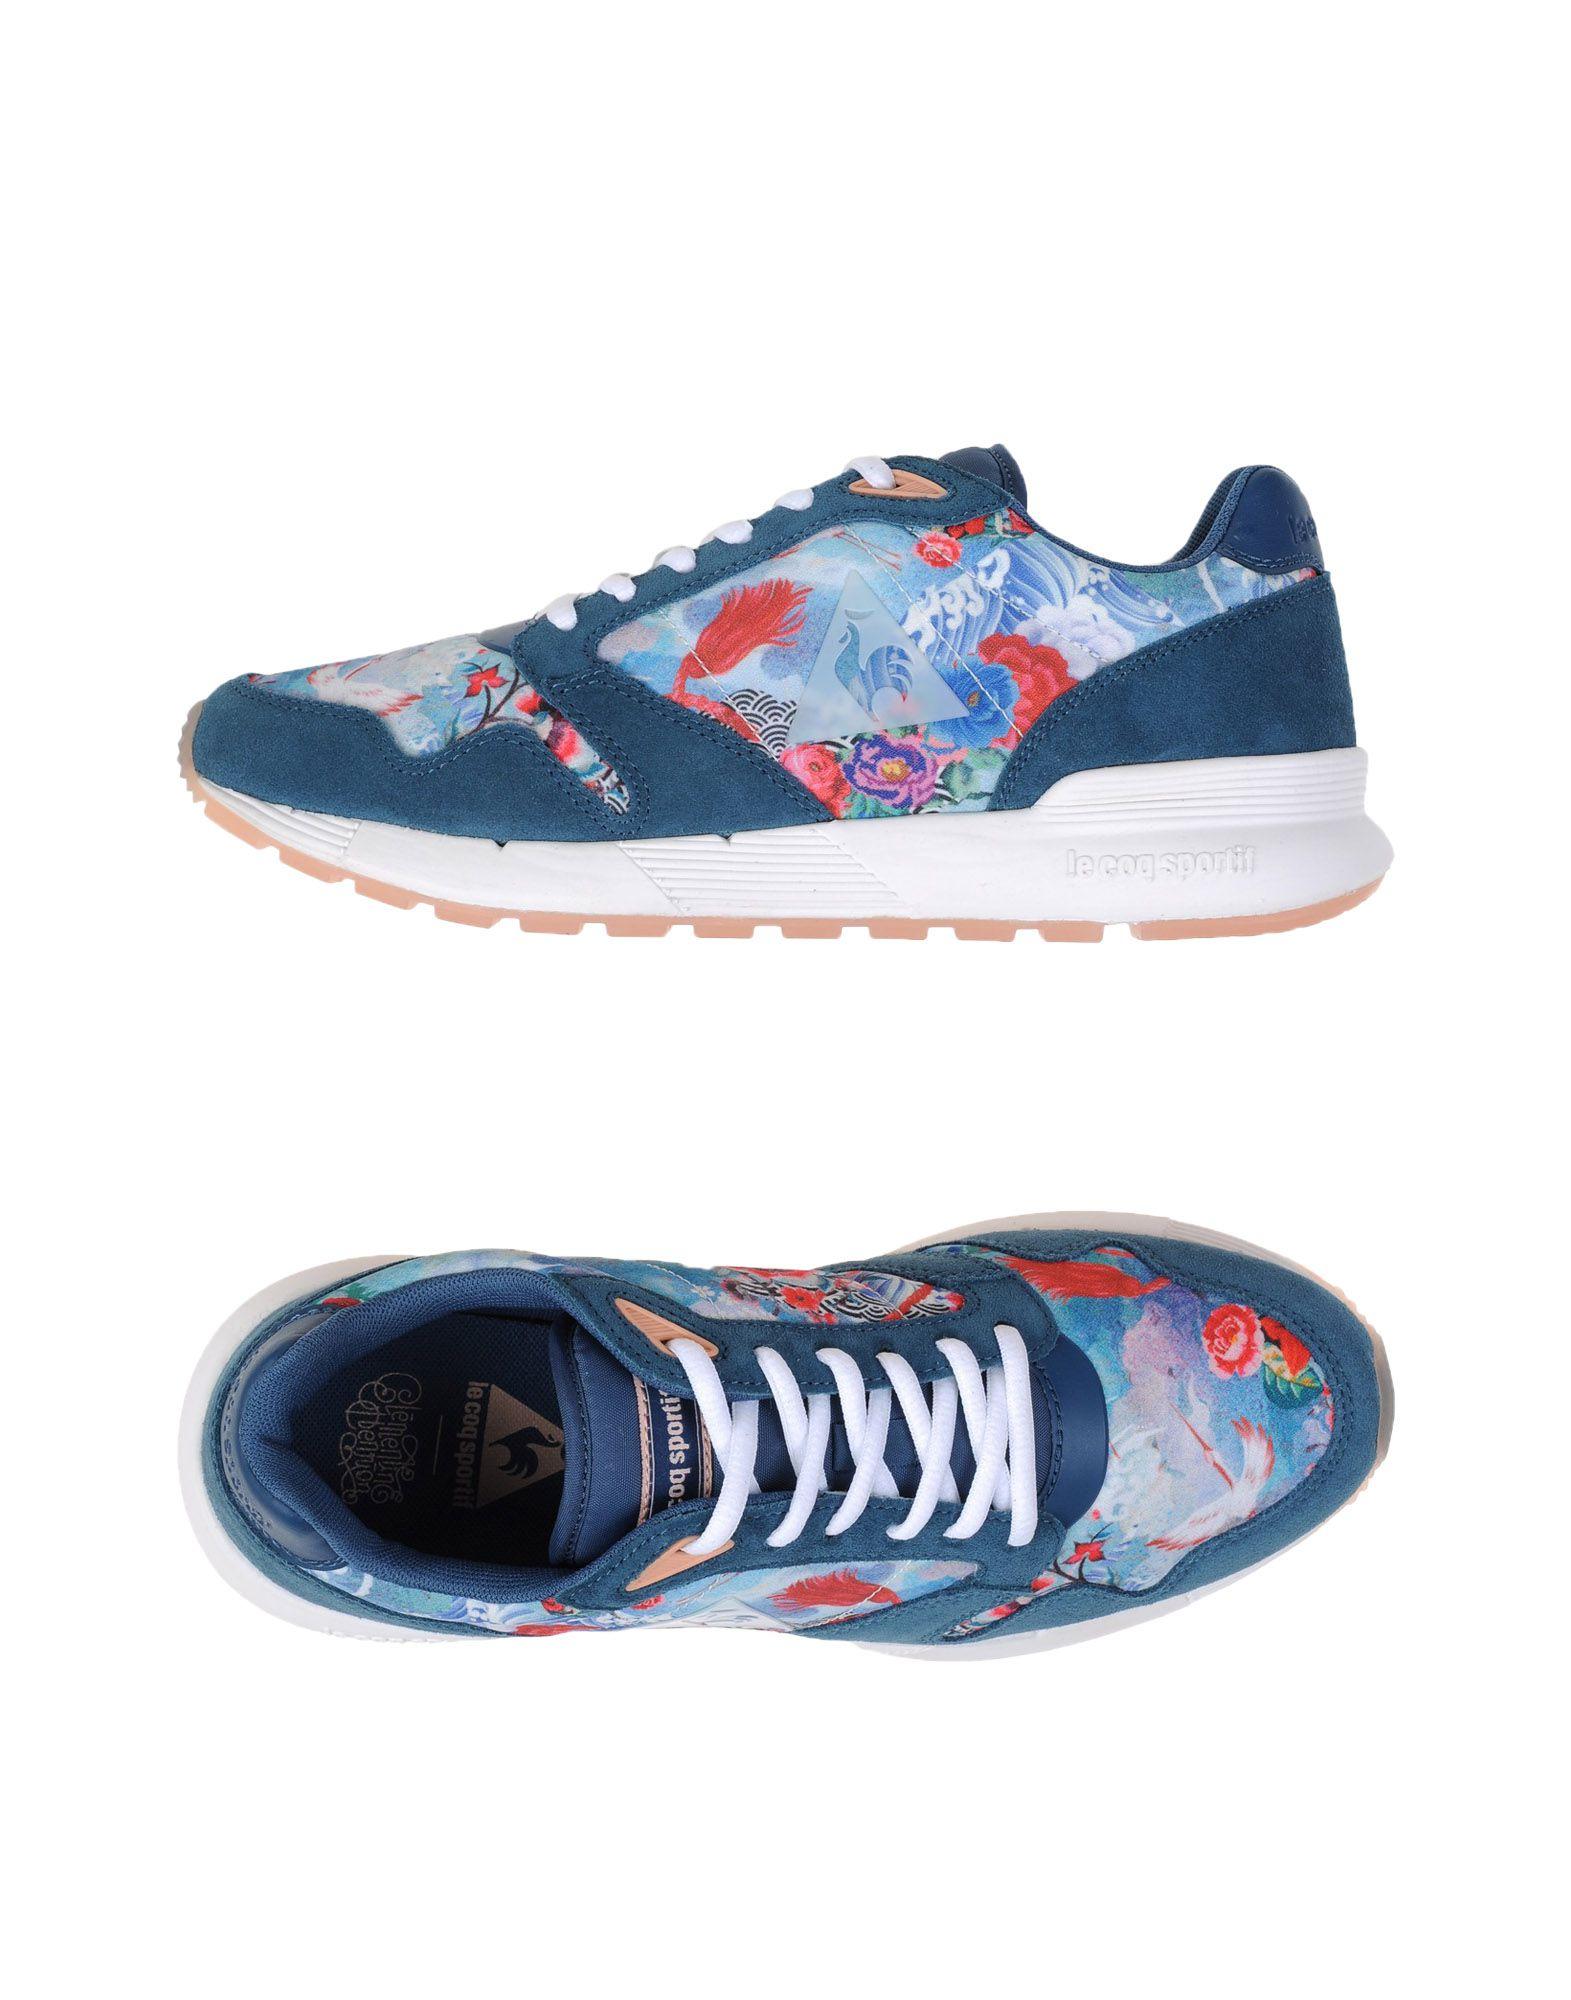 Le Coq Sportif Omega X W Qualität Patchwork 11110726LH Gute Qualität W beliebte Schuhe 210243